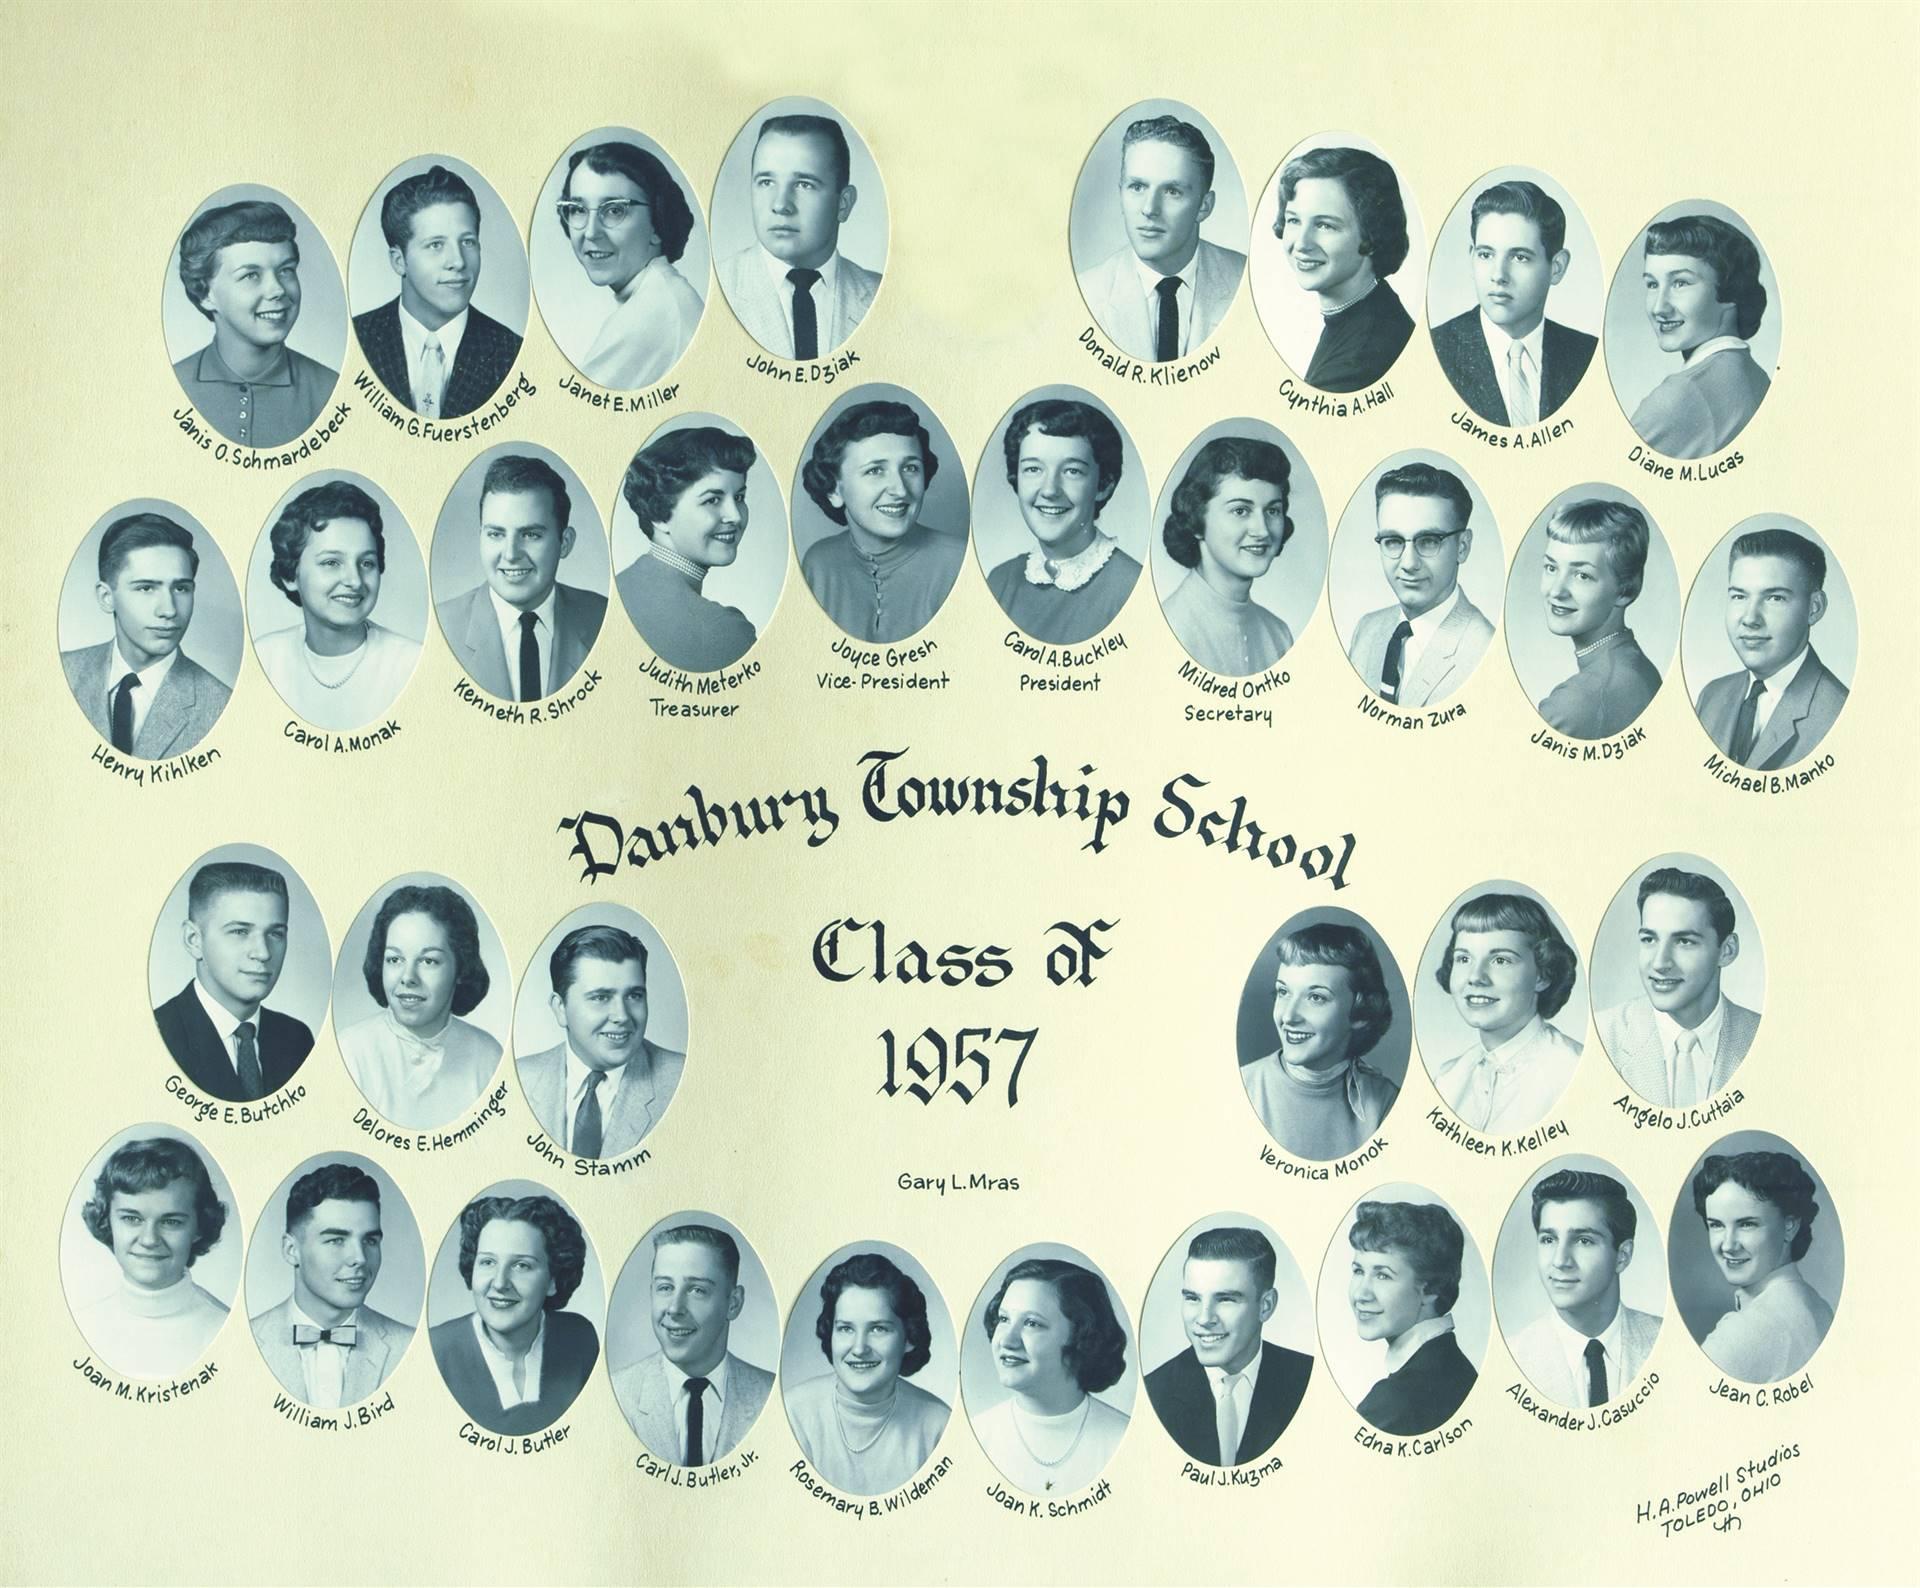 Class of 1957